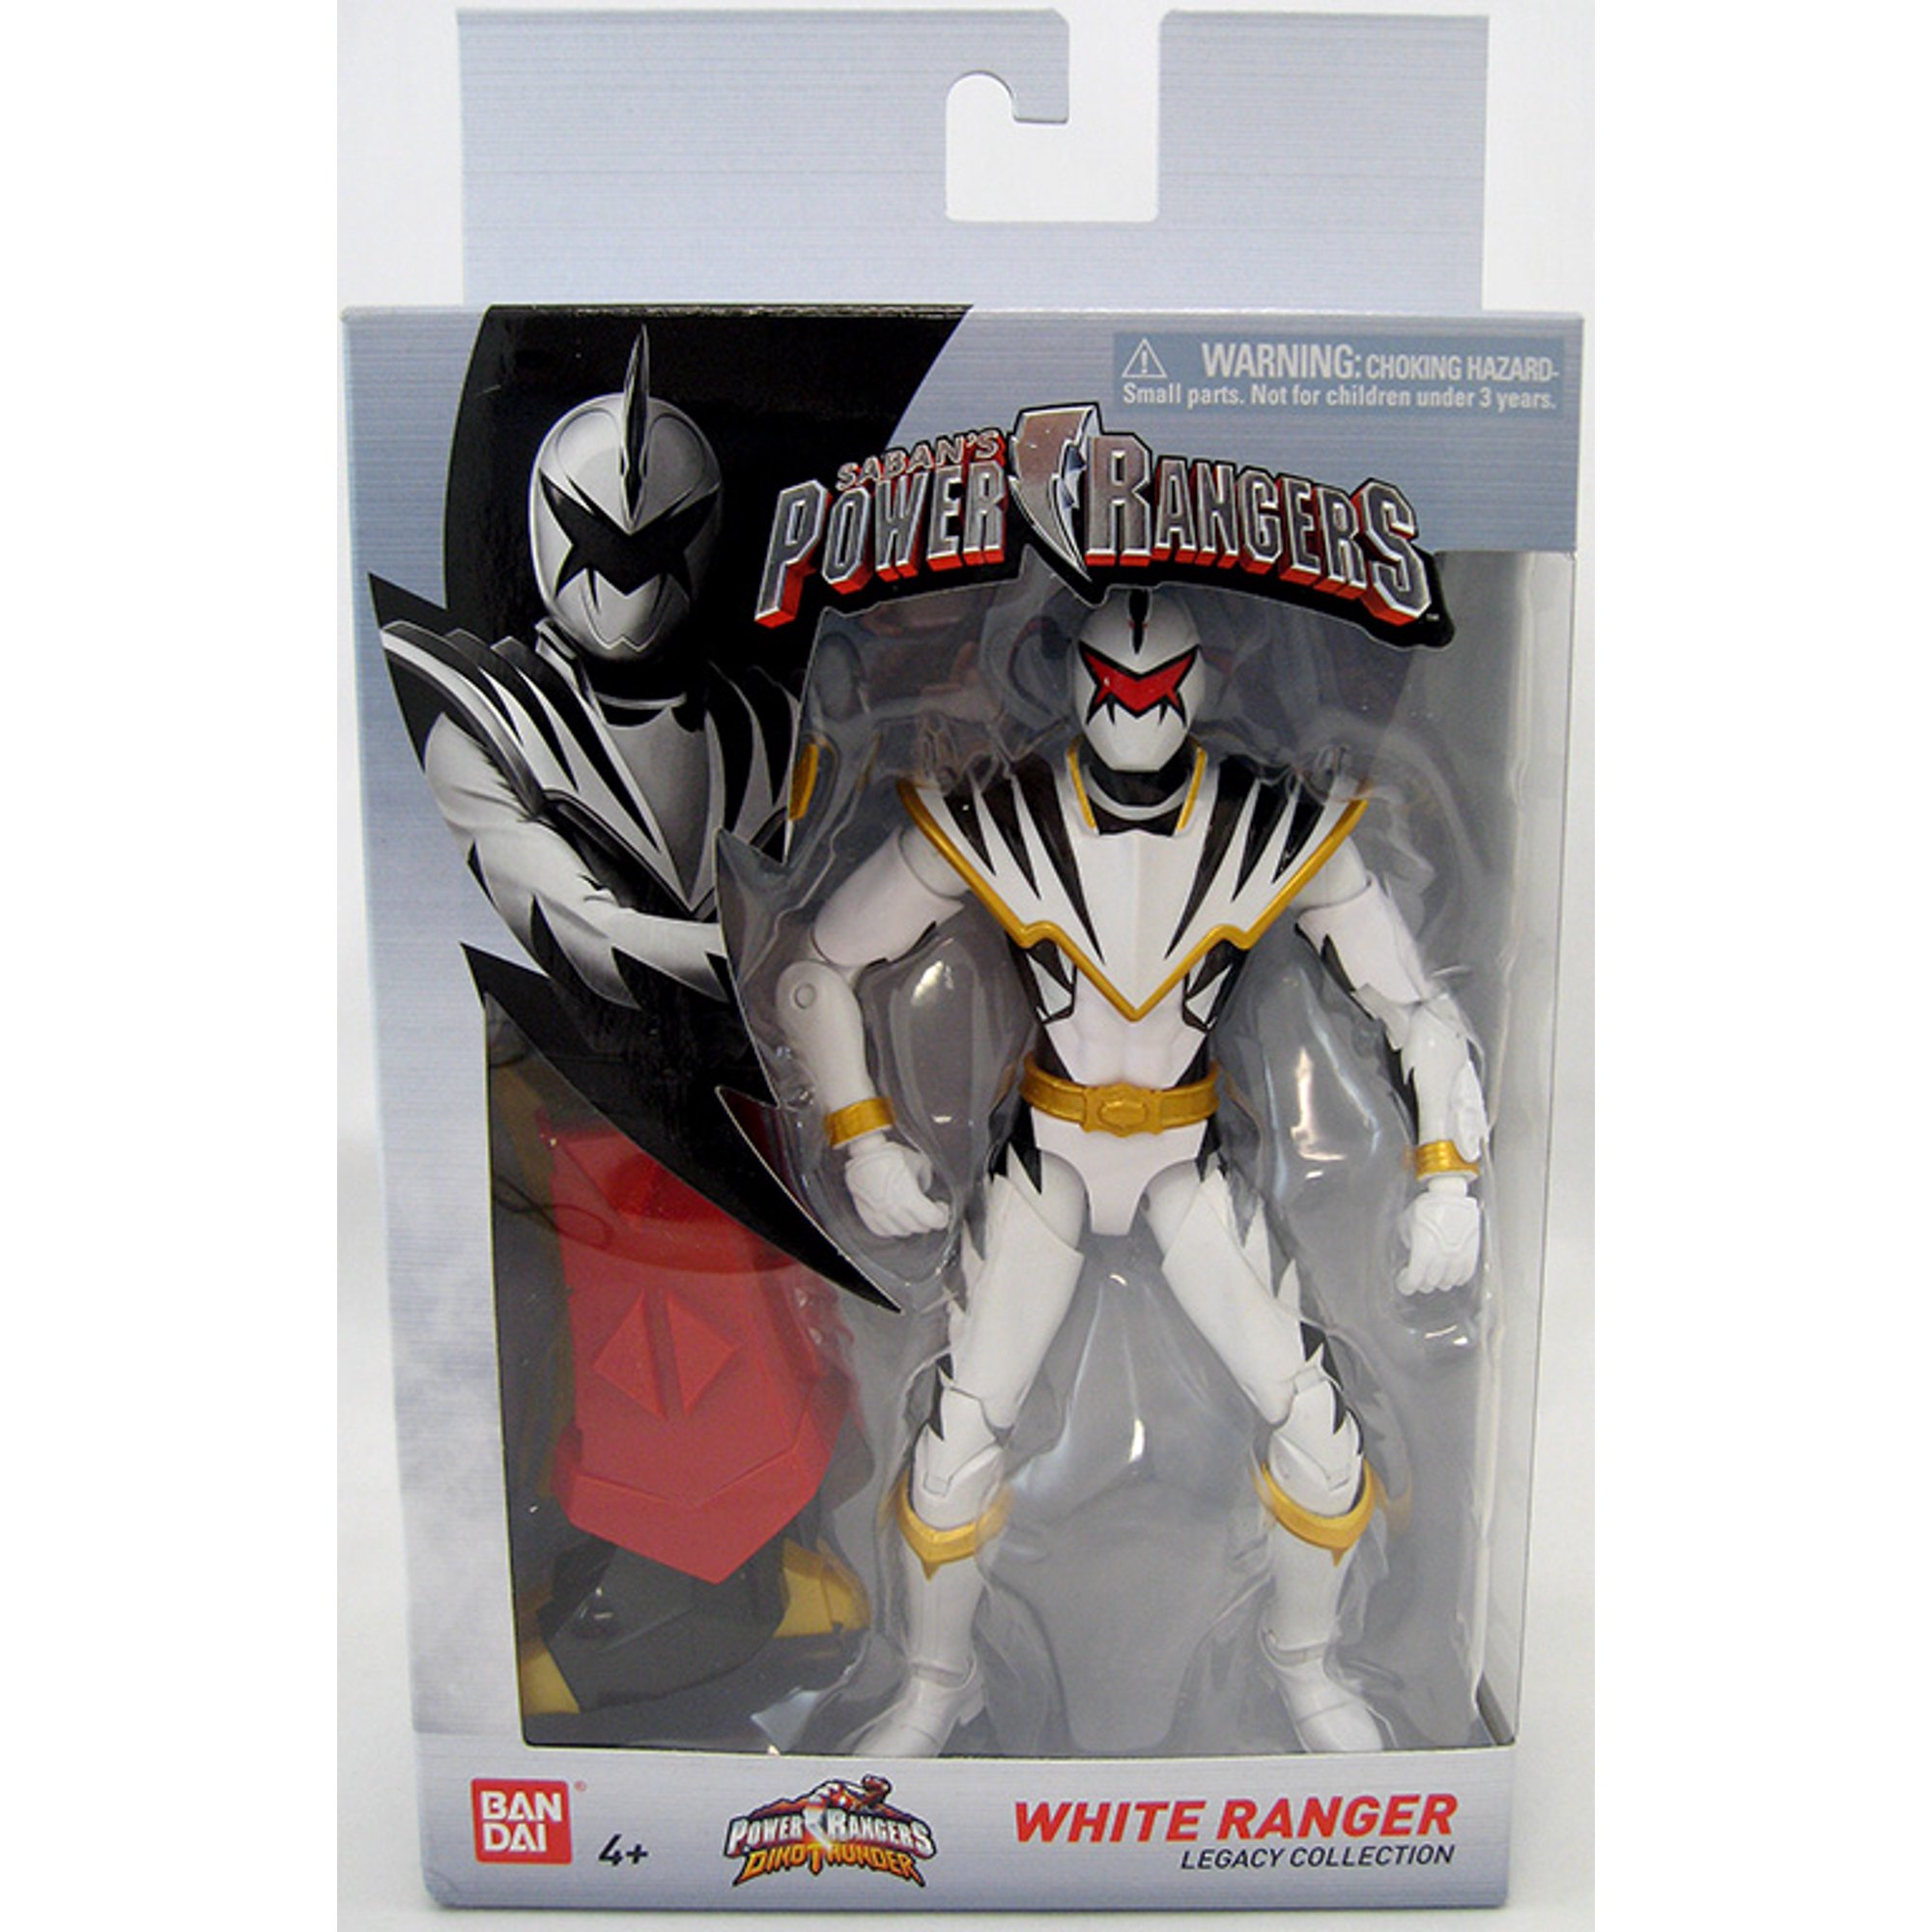 Power Rangers Legacy 6 Inch Action Figure Thundersaurus